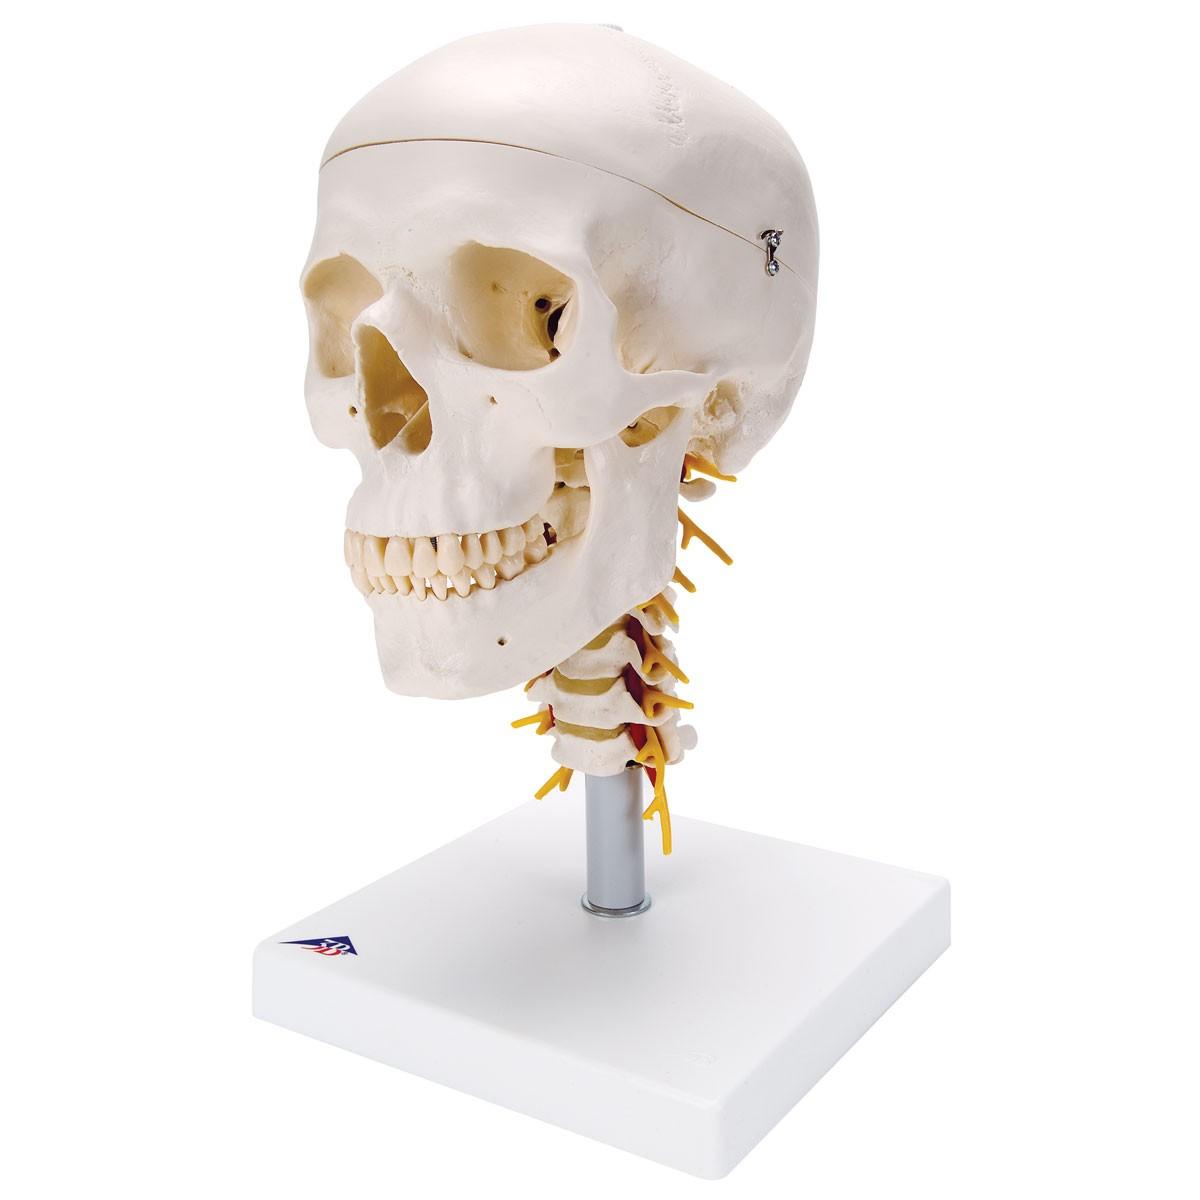 Klassik-Schädel auf Halswirbelsäule, 4-teilig